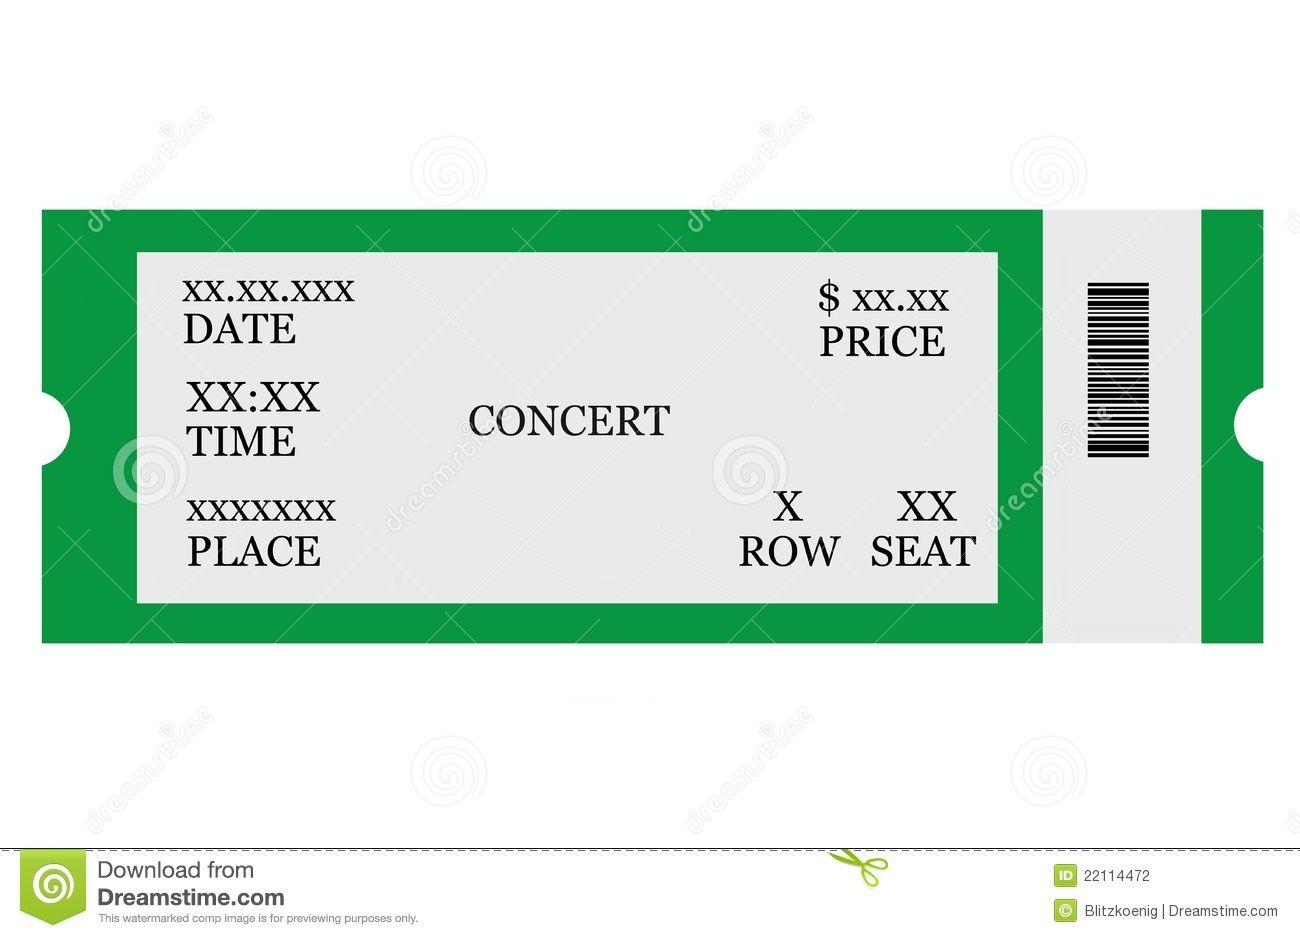 008 Incredible Free Concert Ticket Maker Template Sample  Printable GiftFull